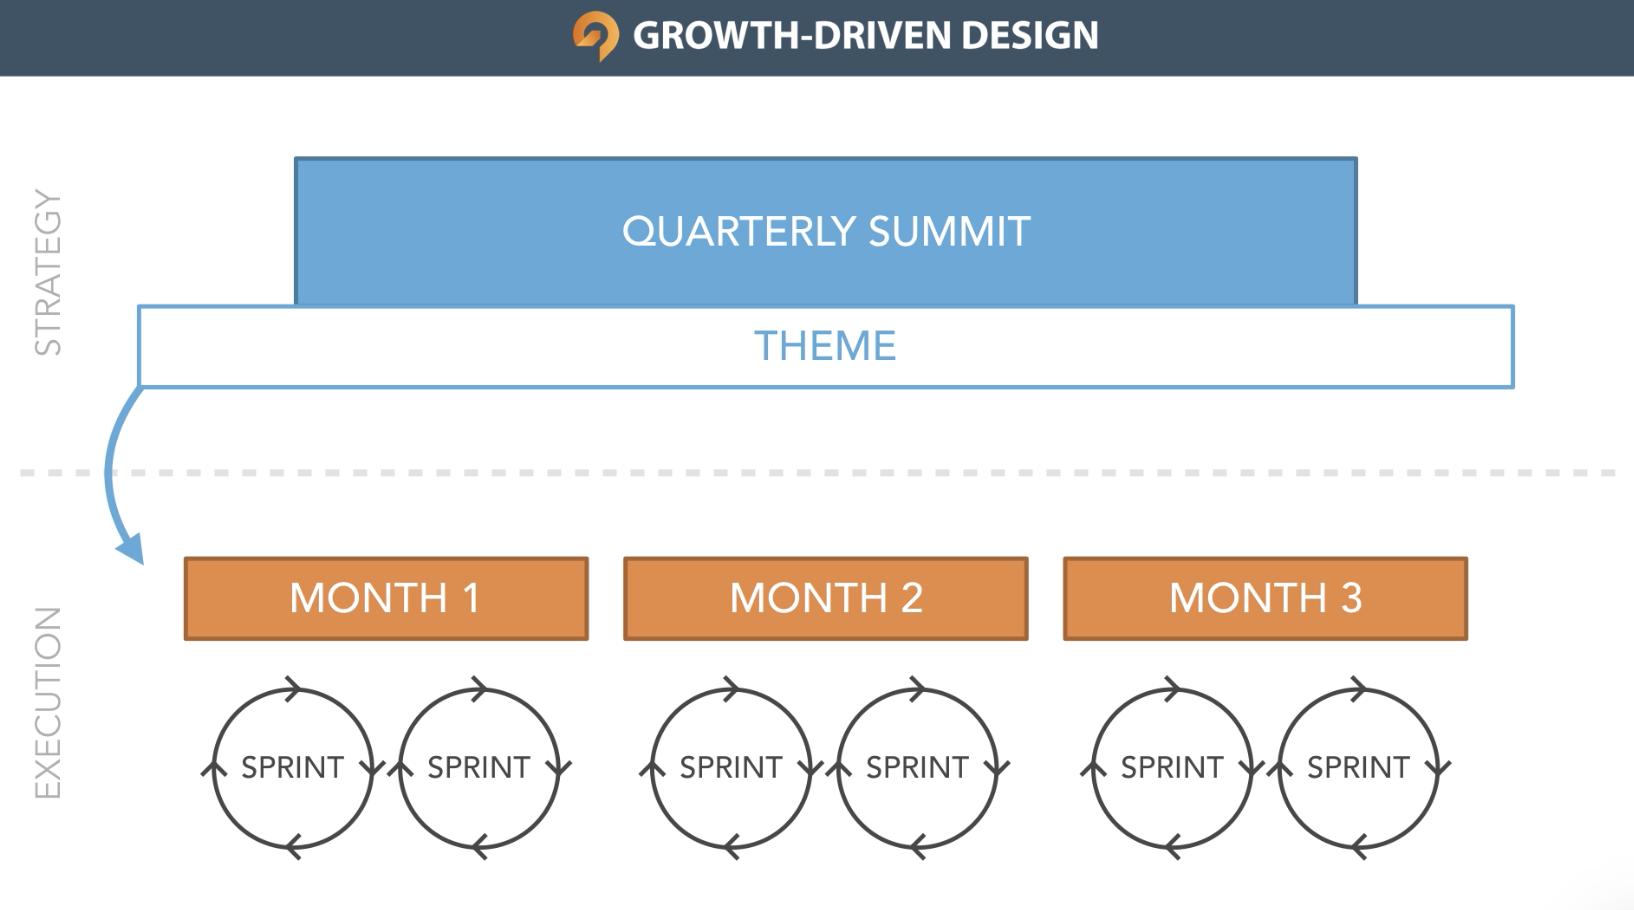 growth-driven-design-continuous-improvement-stages-sprints